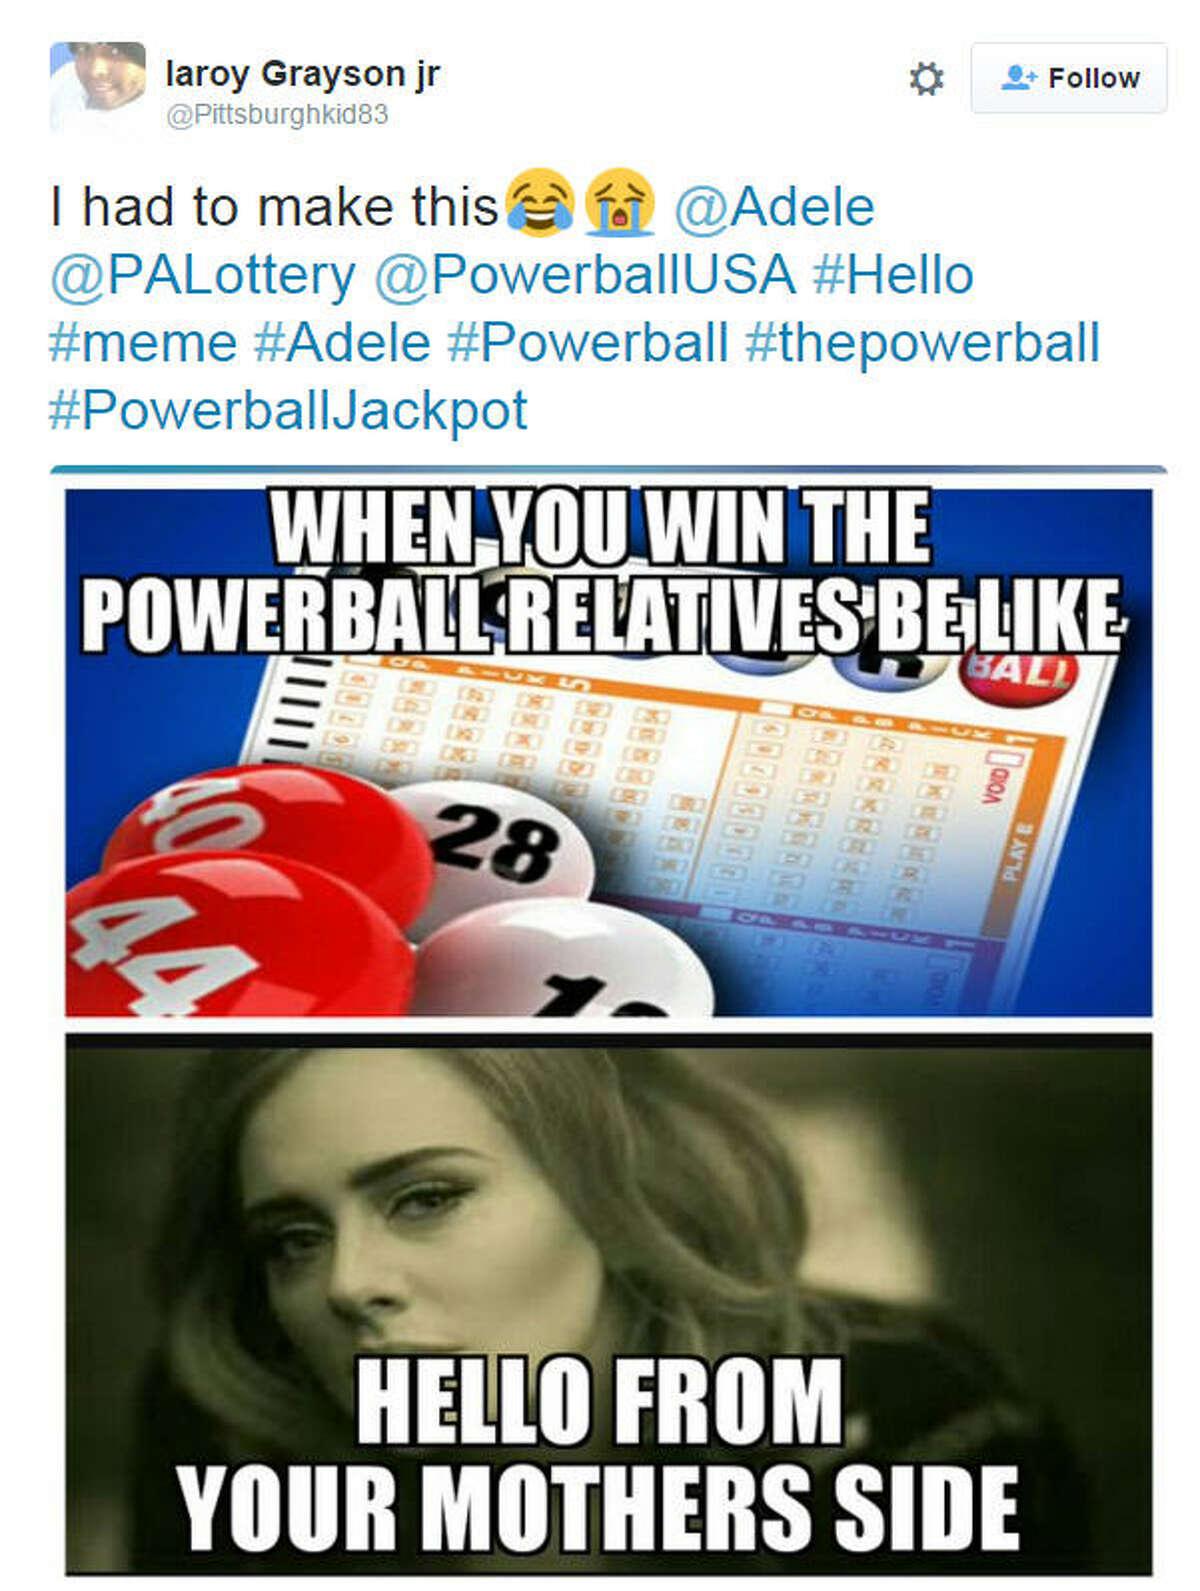 Powerball meme via @Pittsburghkid83 on Twitter